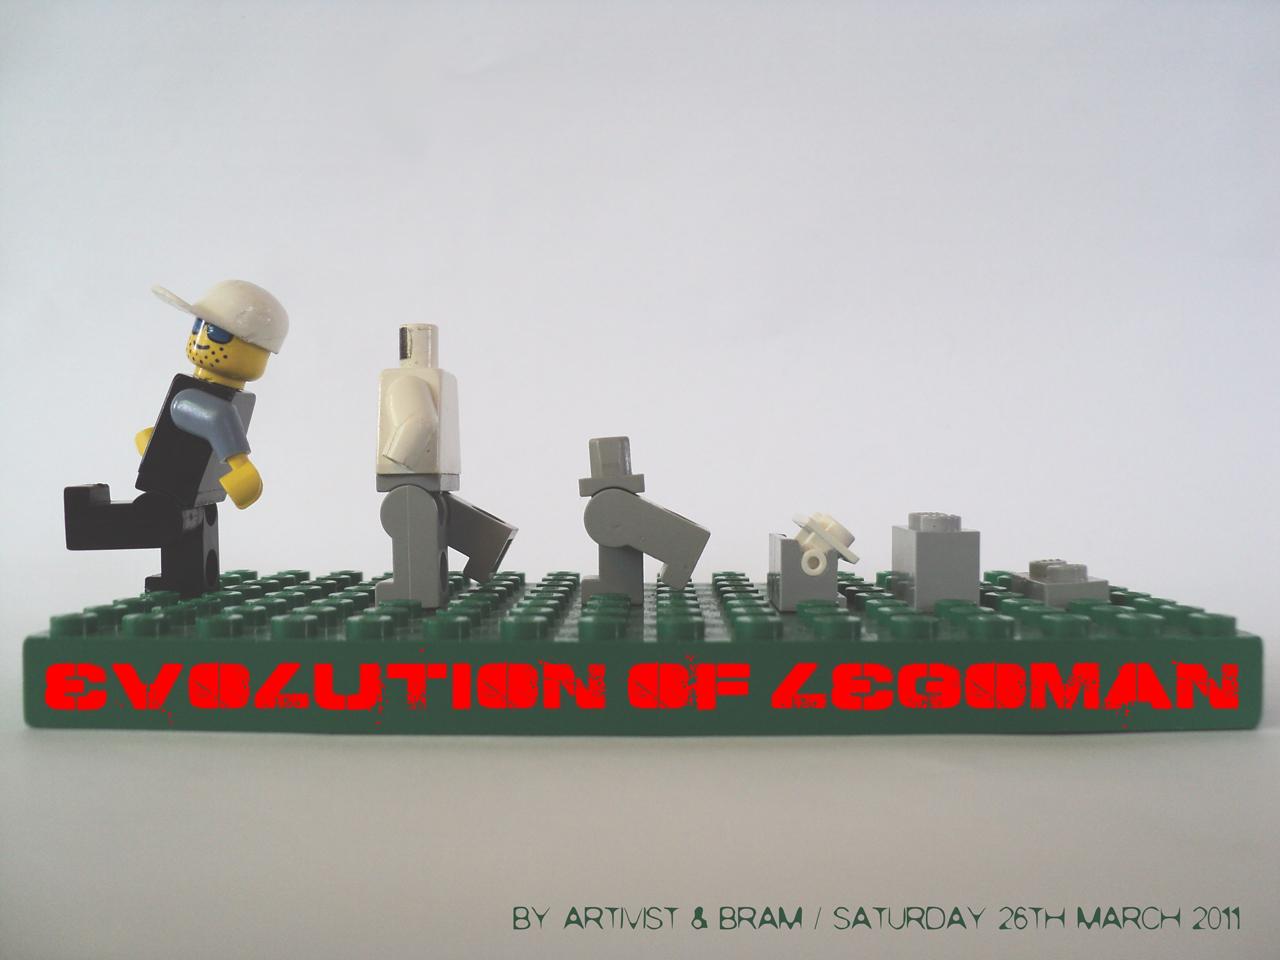 the evolution of legoman <<< Bram & ARTIVIST make